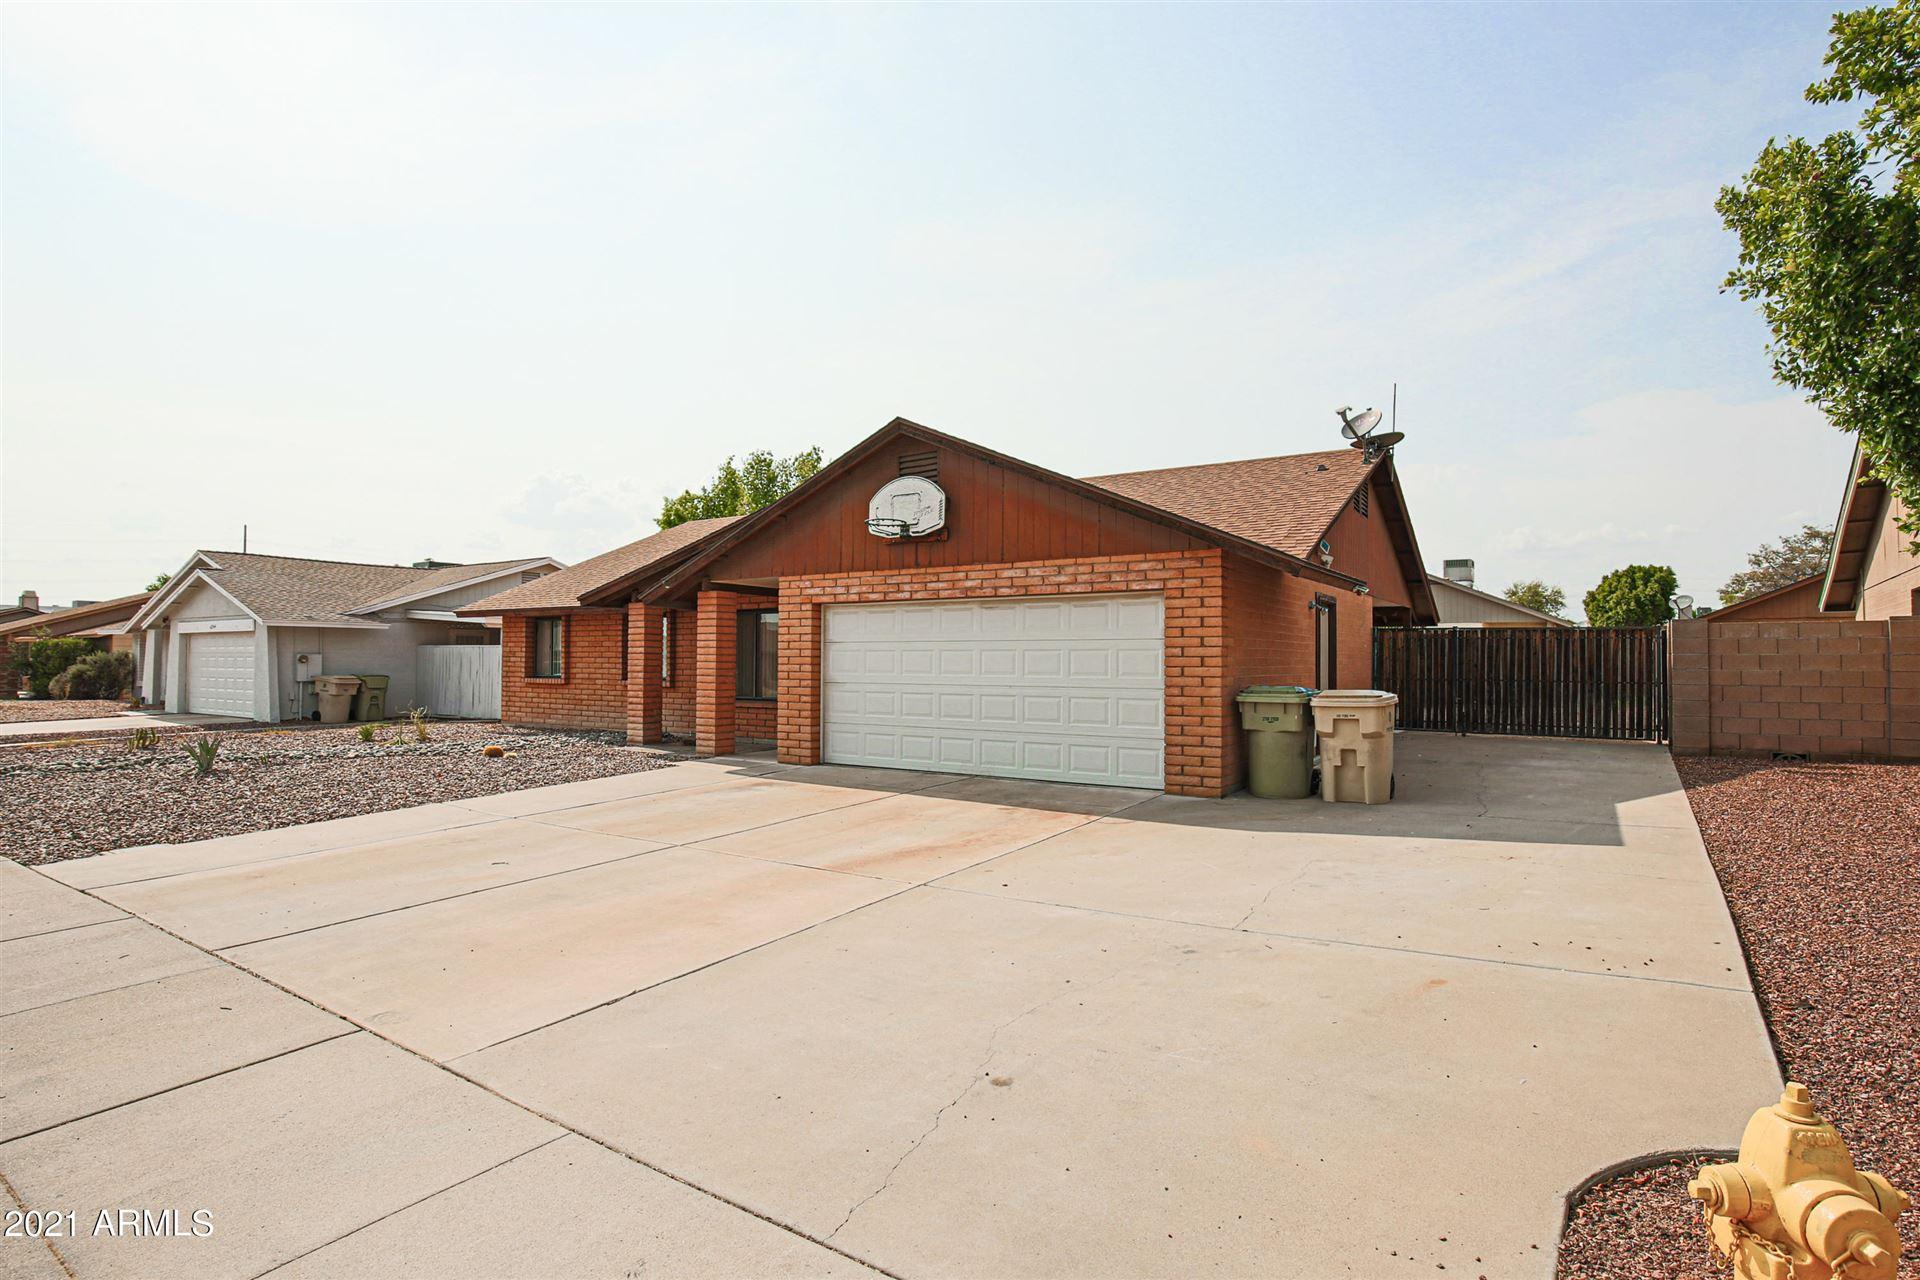 Photo of 6538 W SUNNYSIDE Drive, Glendale, AZ 85304 (MLS # 6269328)